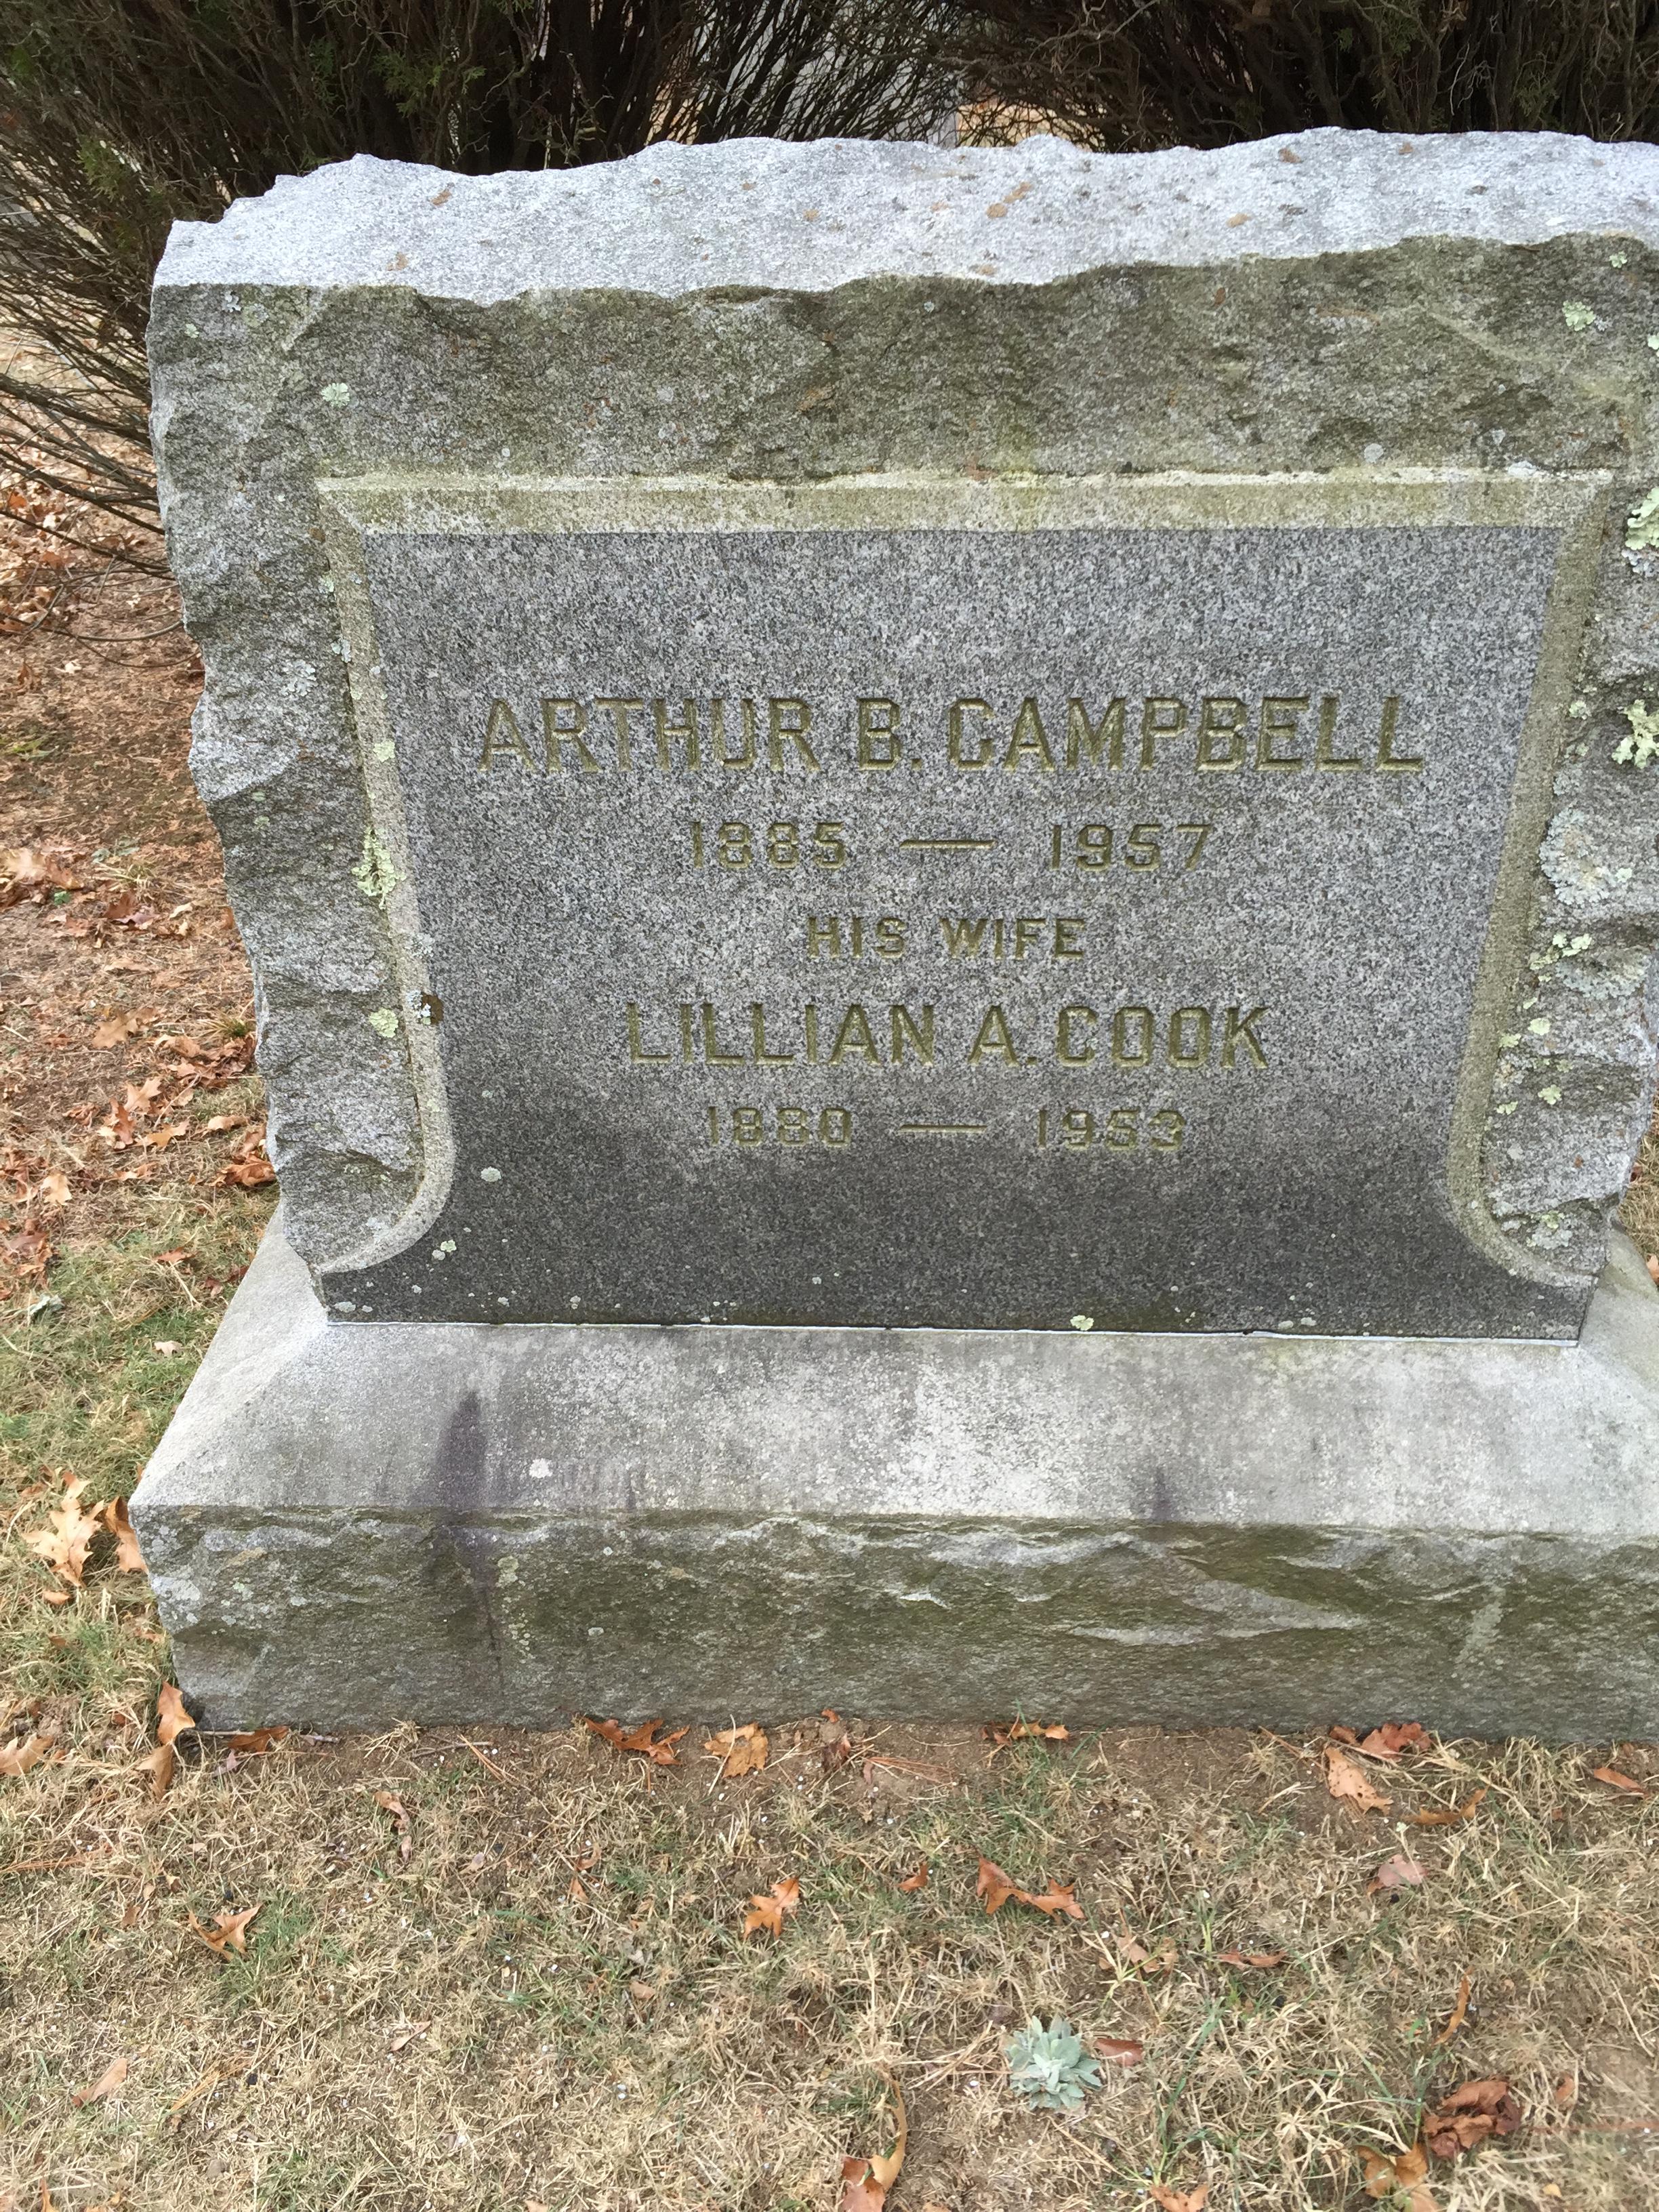 Arthur b Campbell